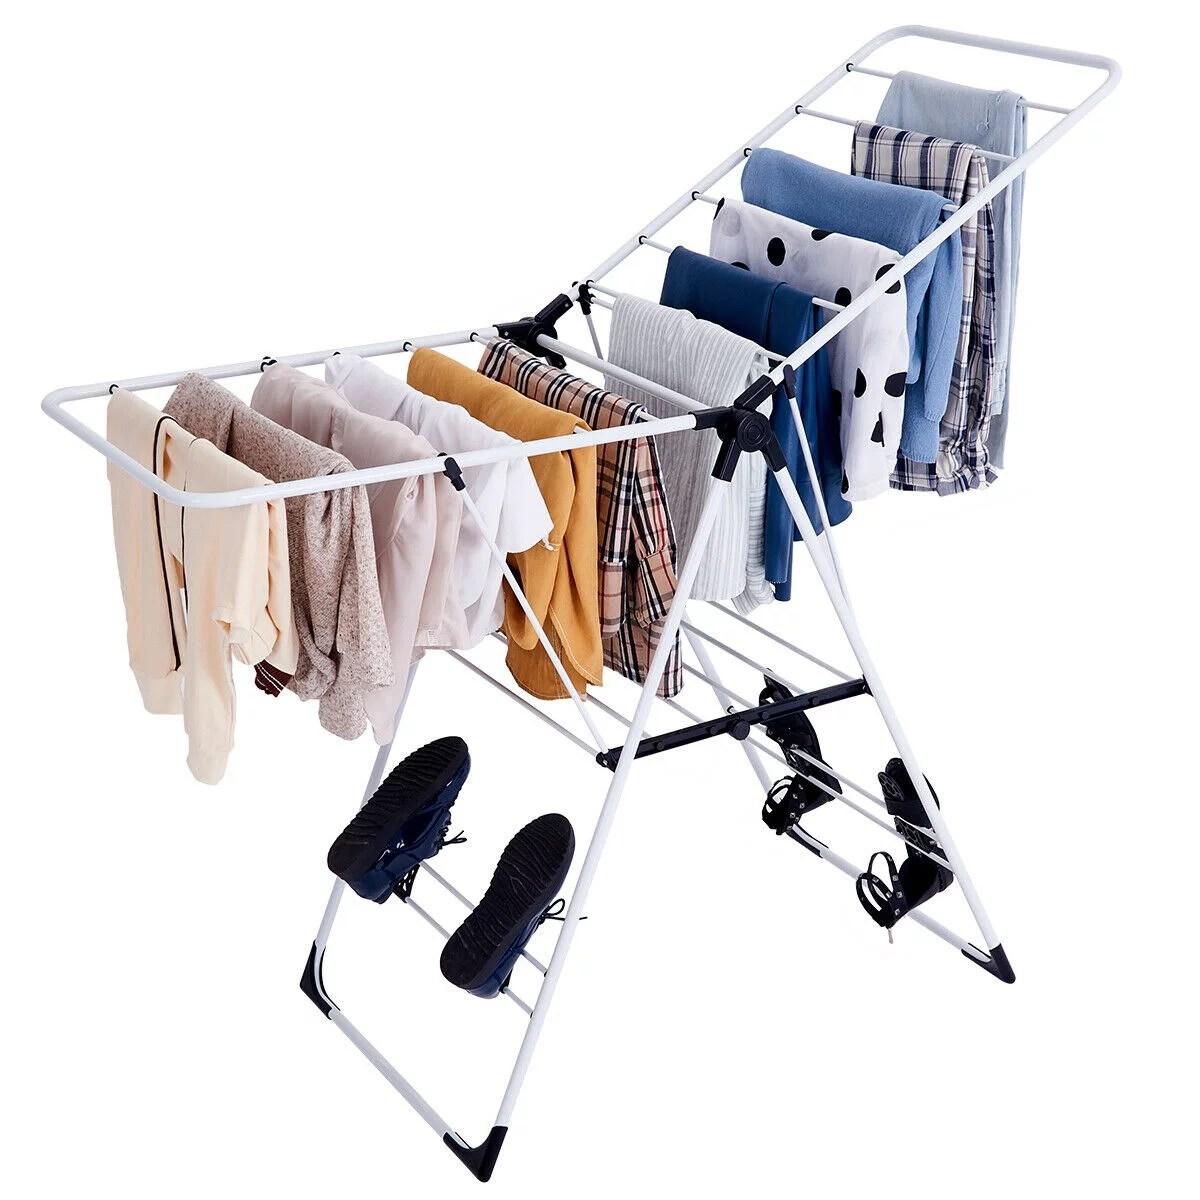 costway laundry clothes storage drying rack portable folding dryer hanger heavy duty walmart com